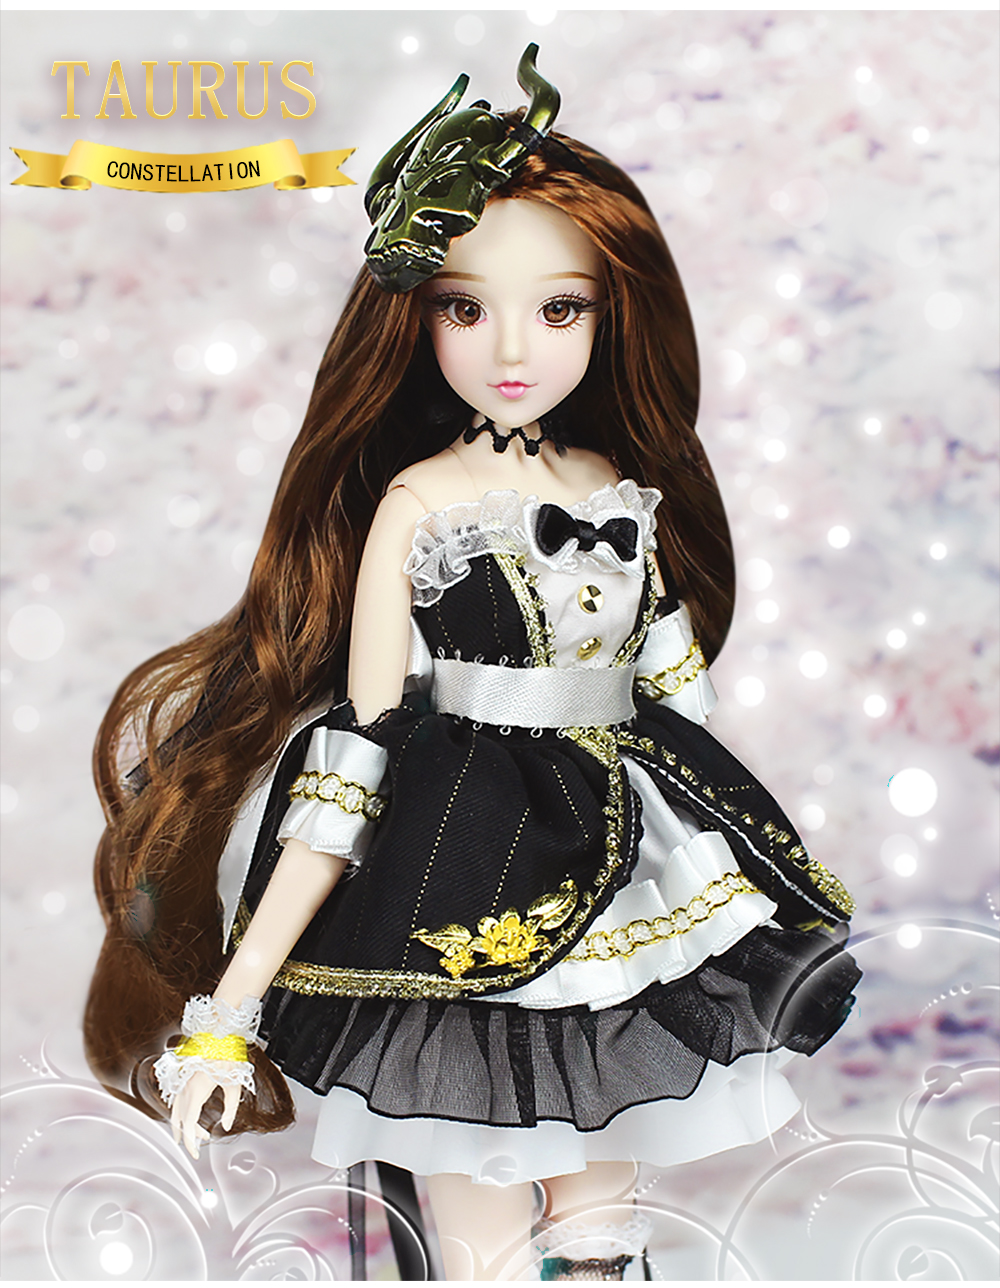 MMGirl 12 星座牡牛座よう BJD 人形 1/6 30 センチメートル高新セットのおもちゃギフト  グループ上の おもちゃ & ホビー からの 人形 の中 2